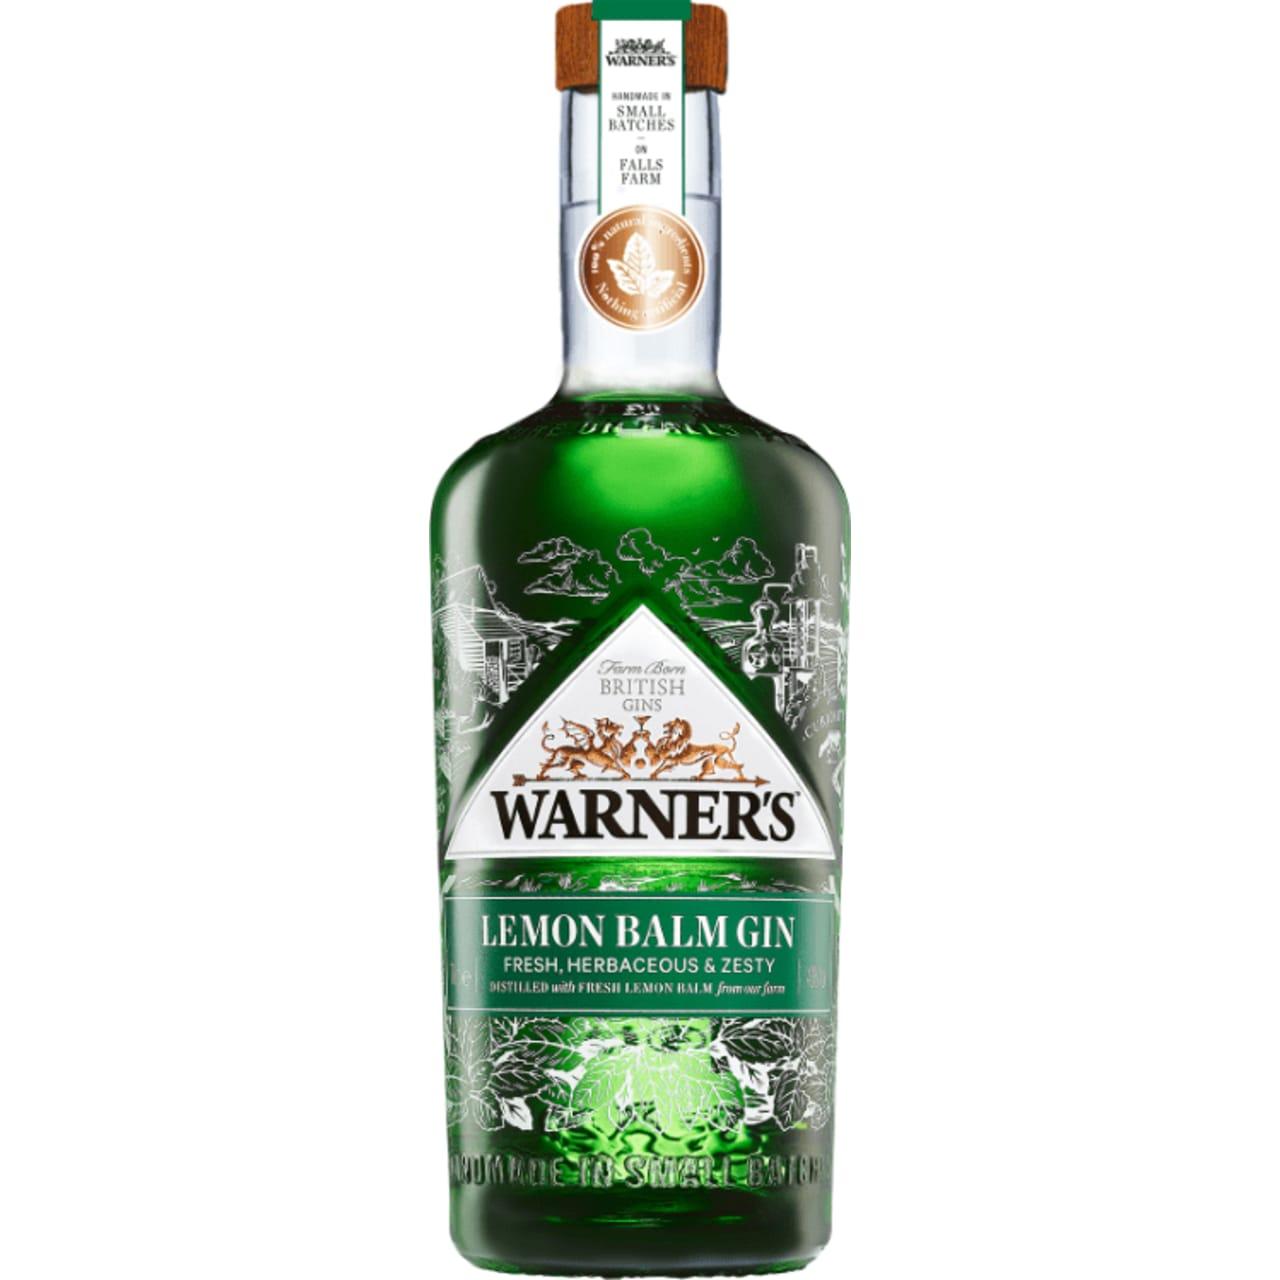 Product Image - Warner's Lemon Balm Gin